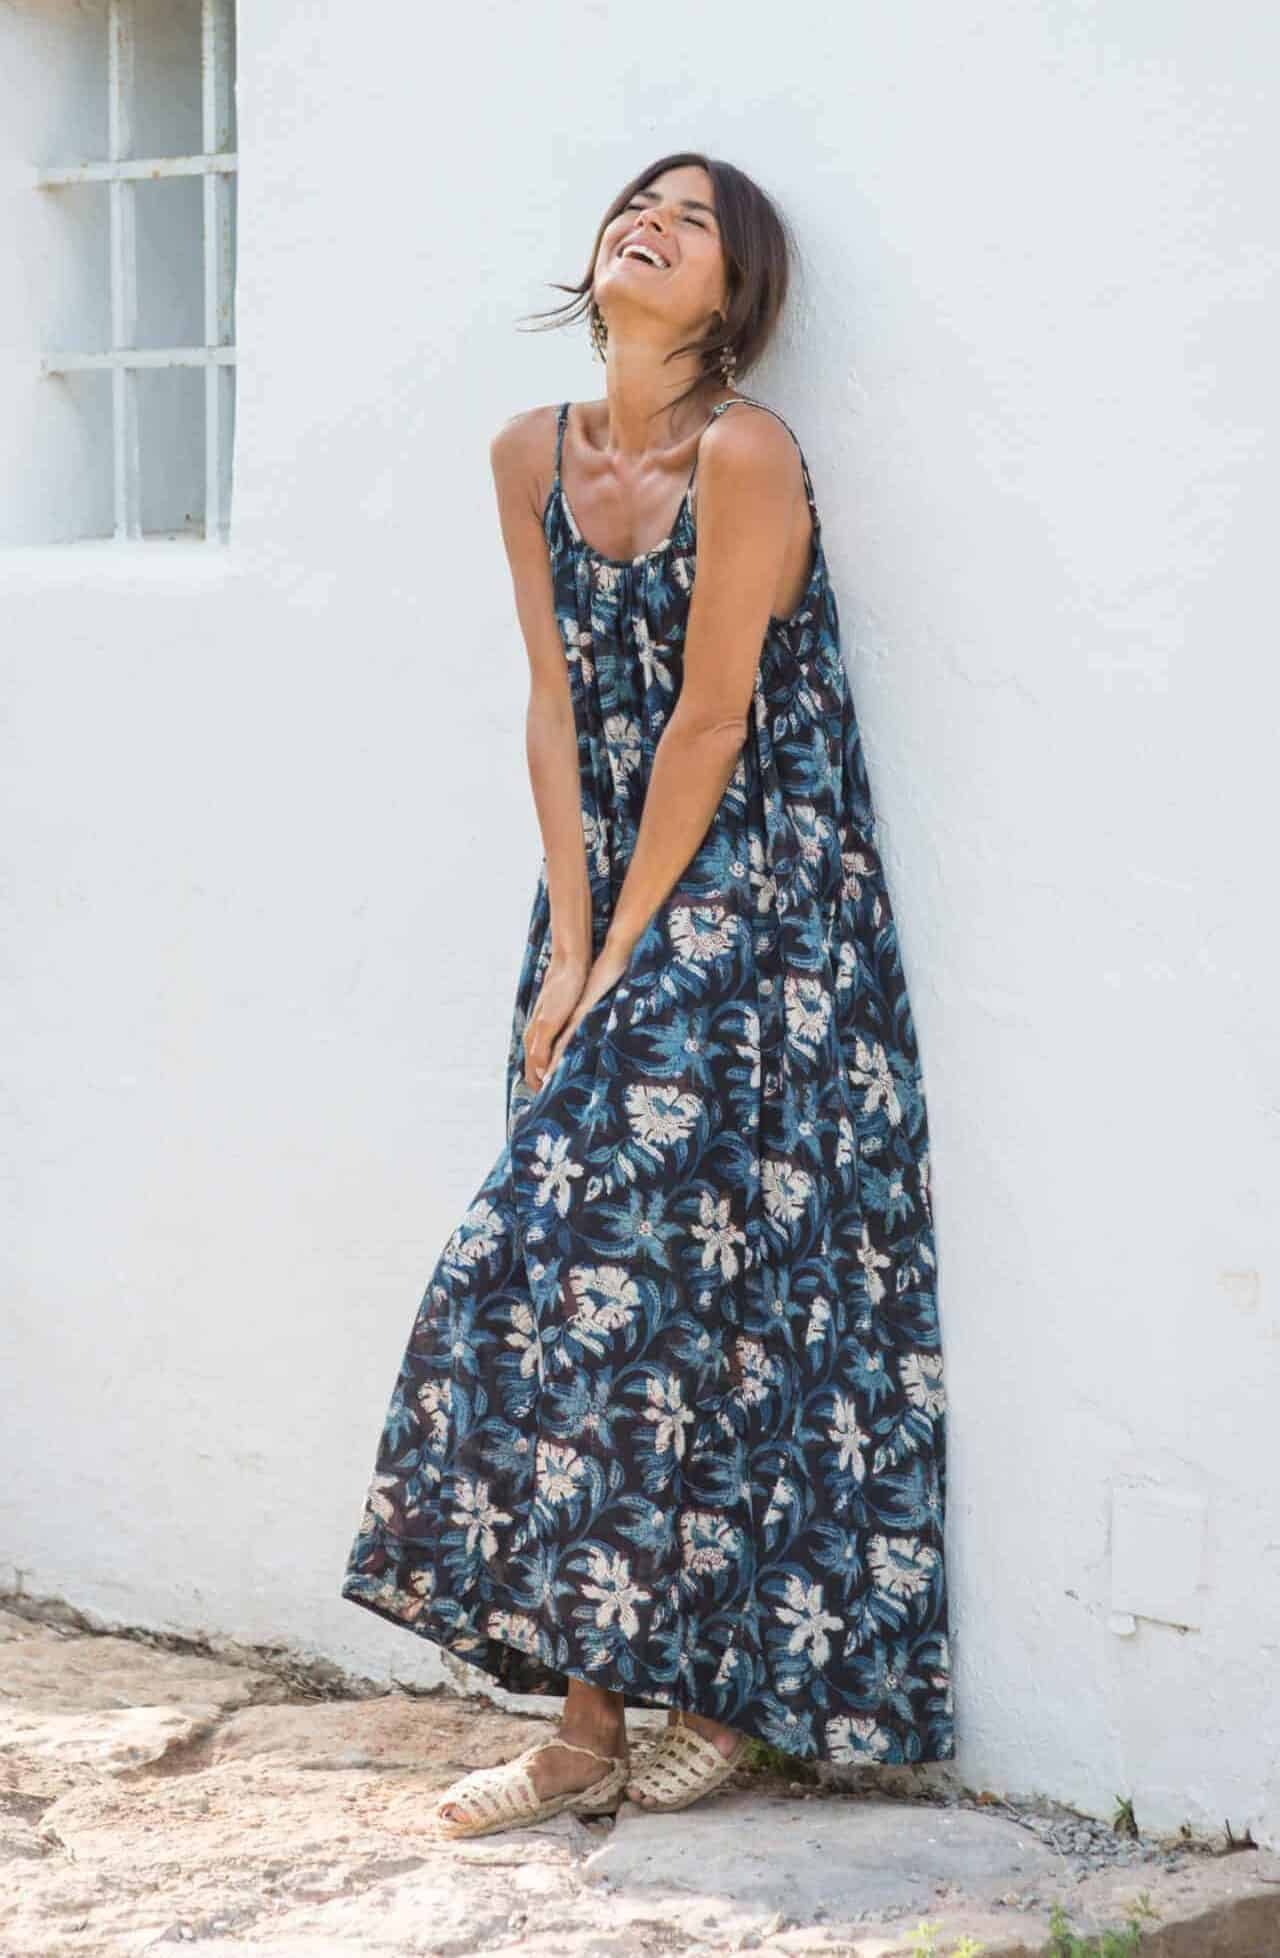 black and blue floral sun dress